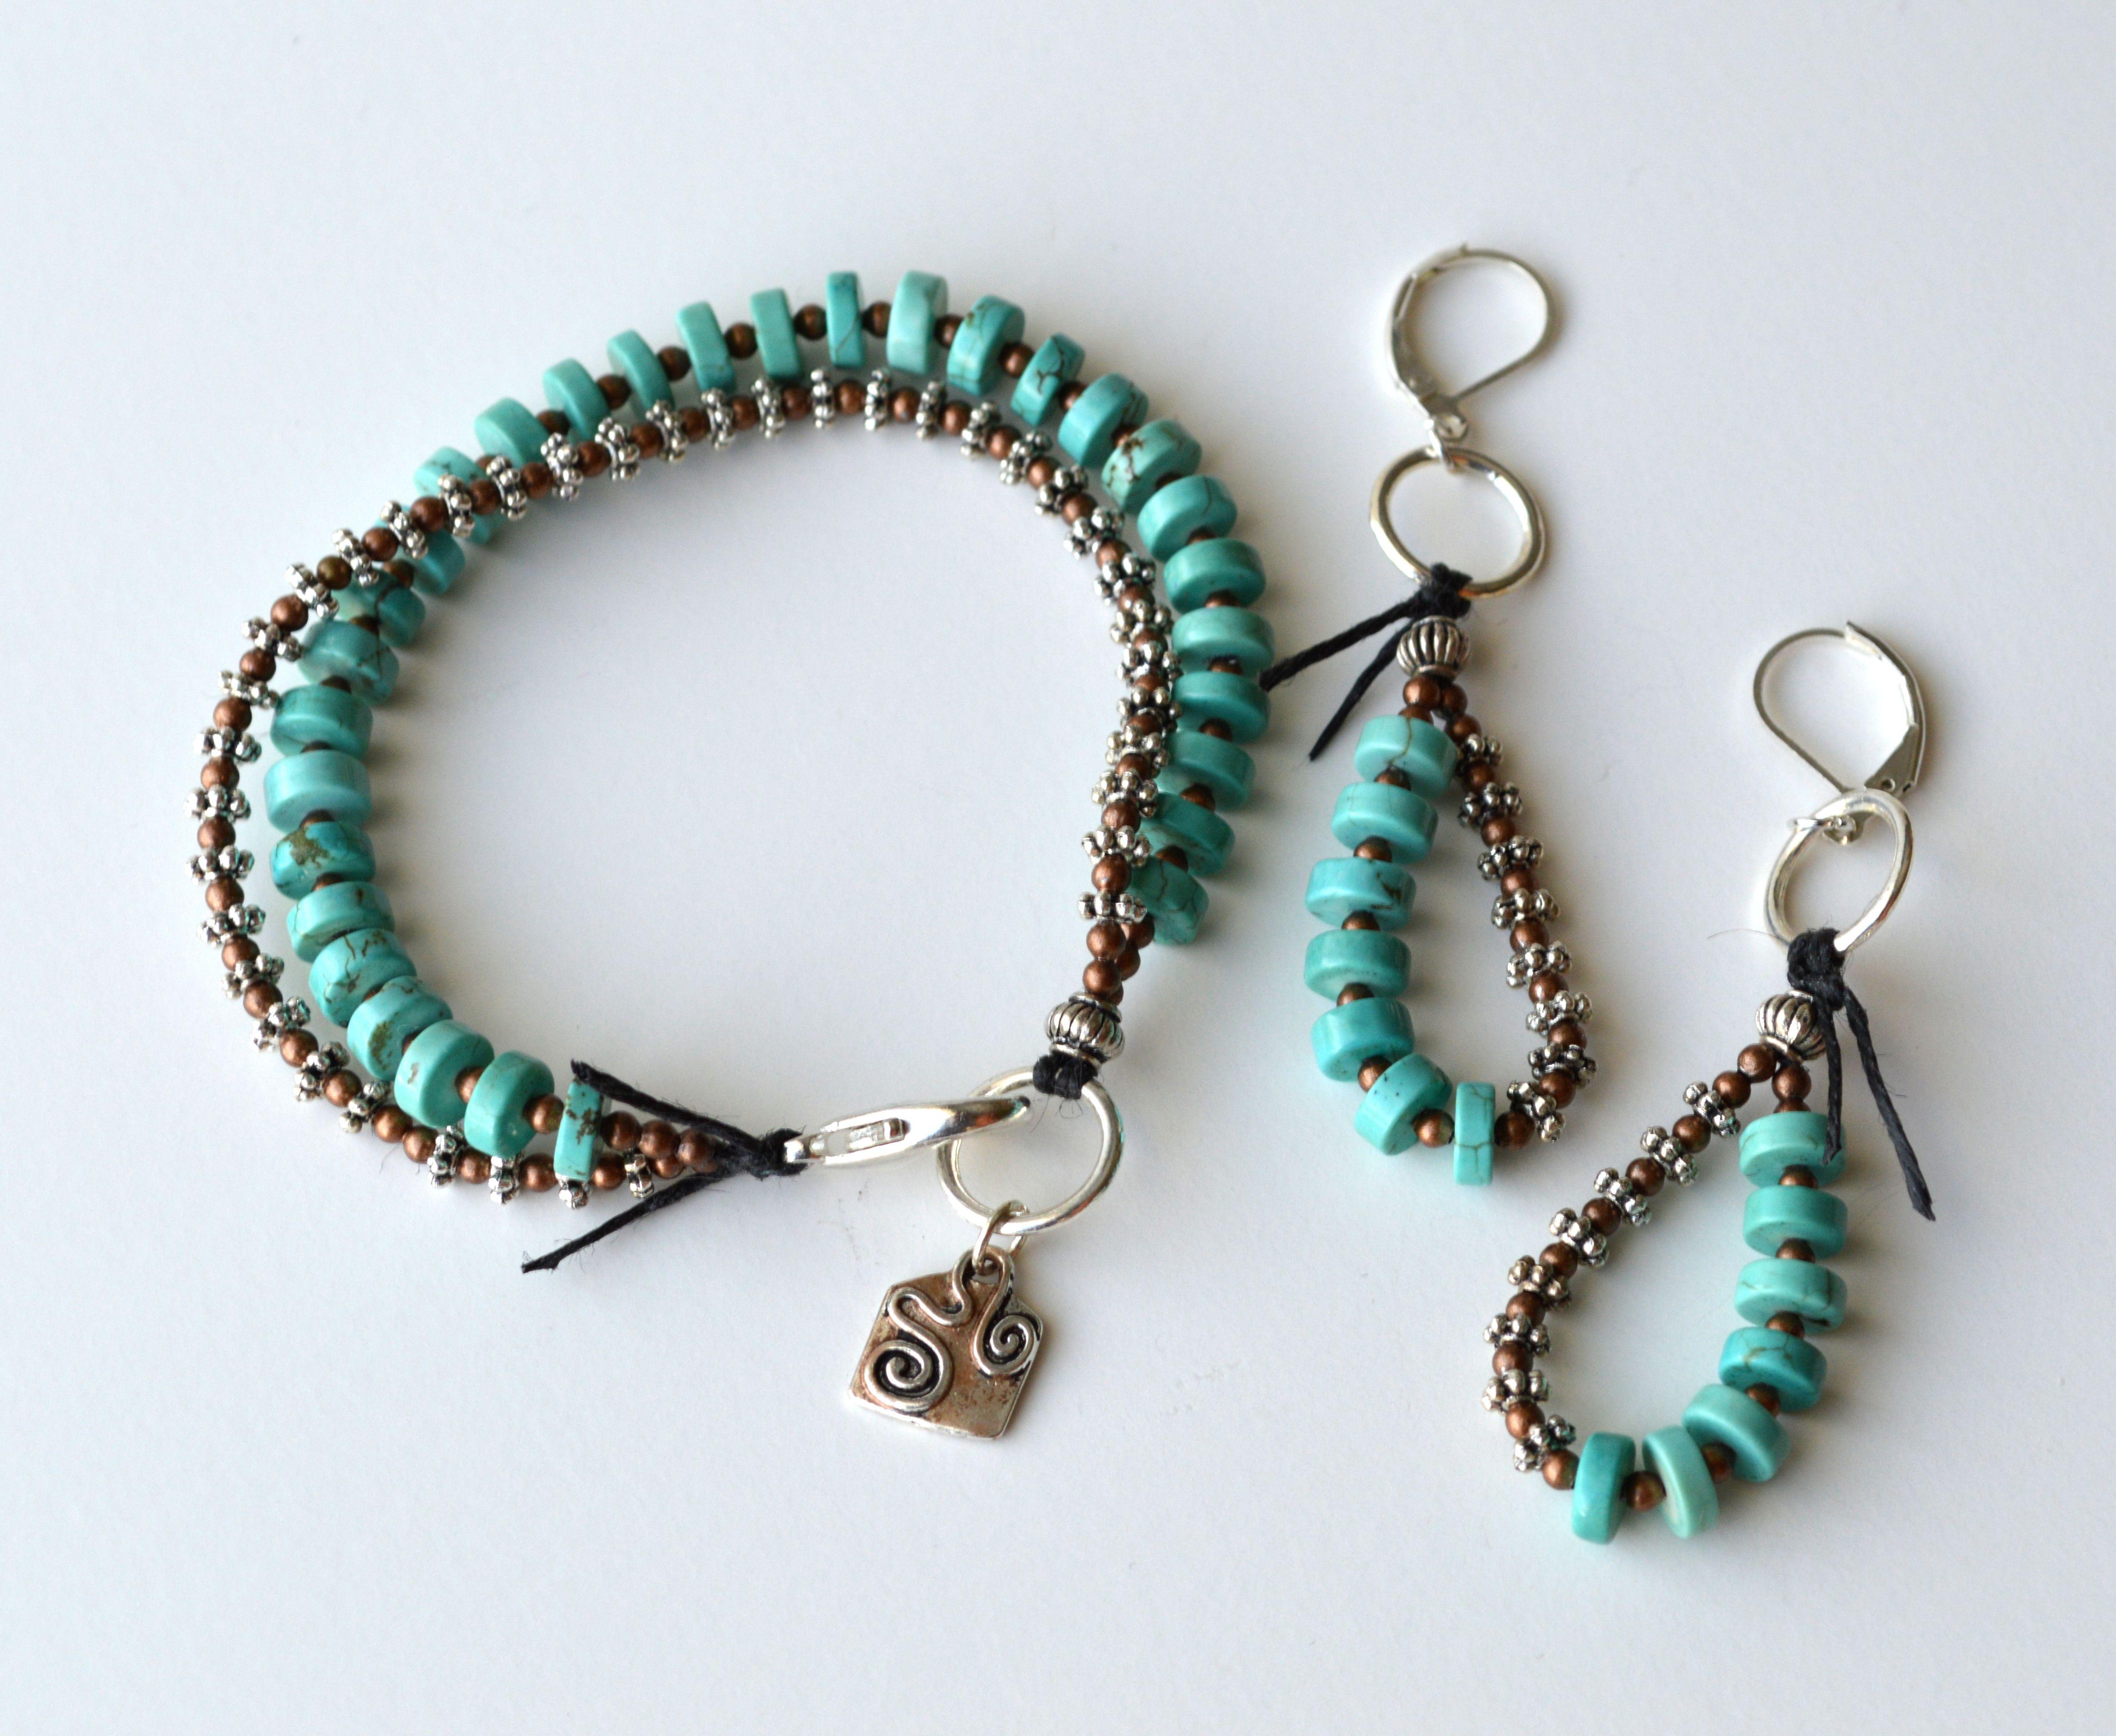 Original and stylish beads 25